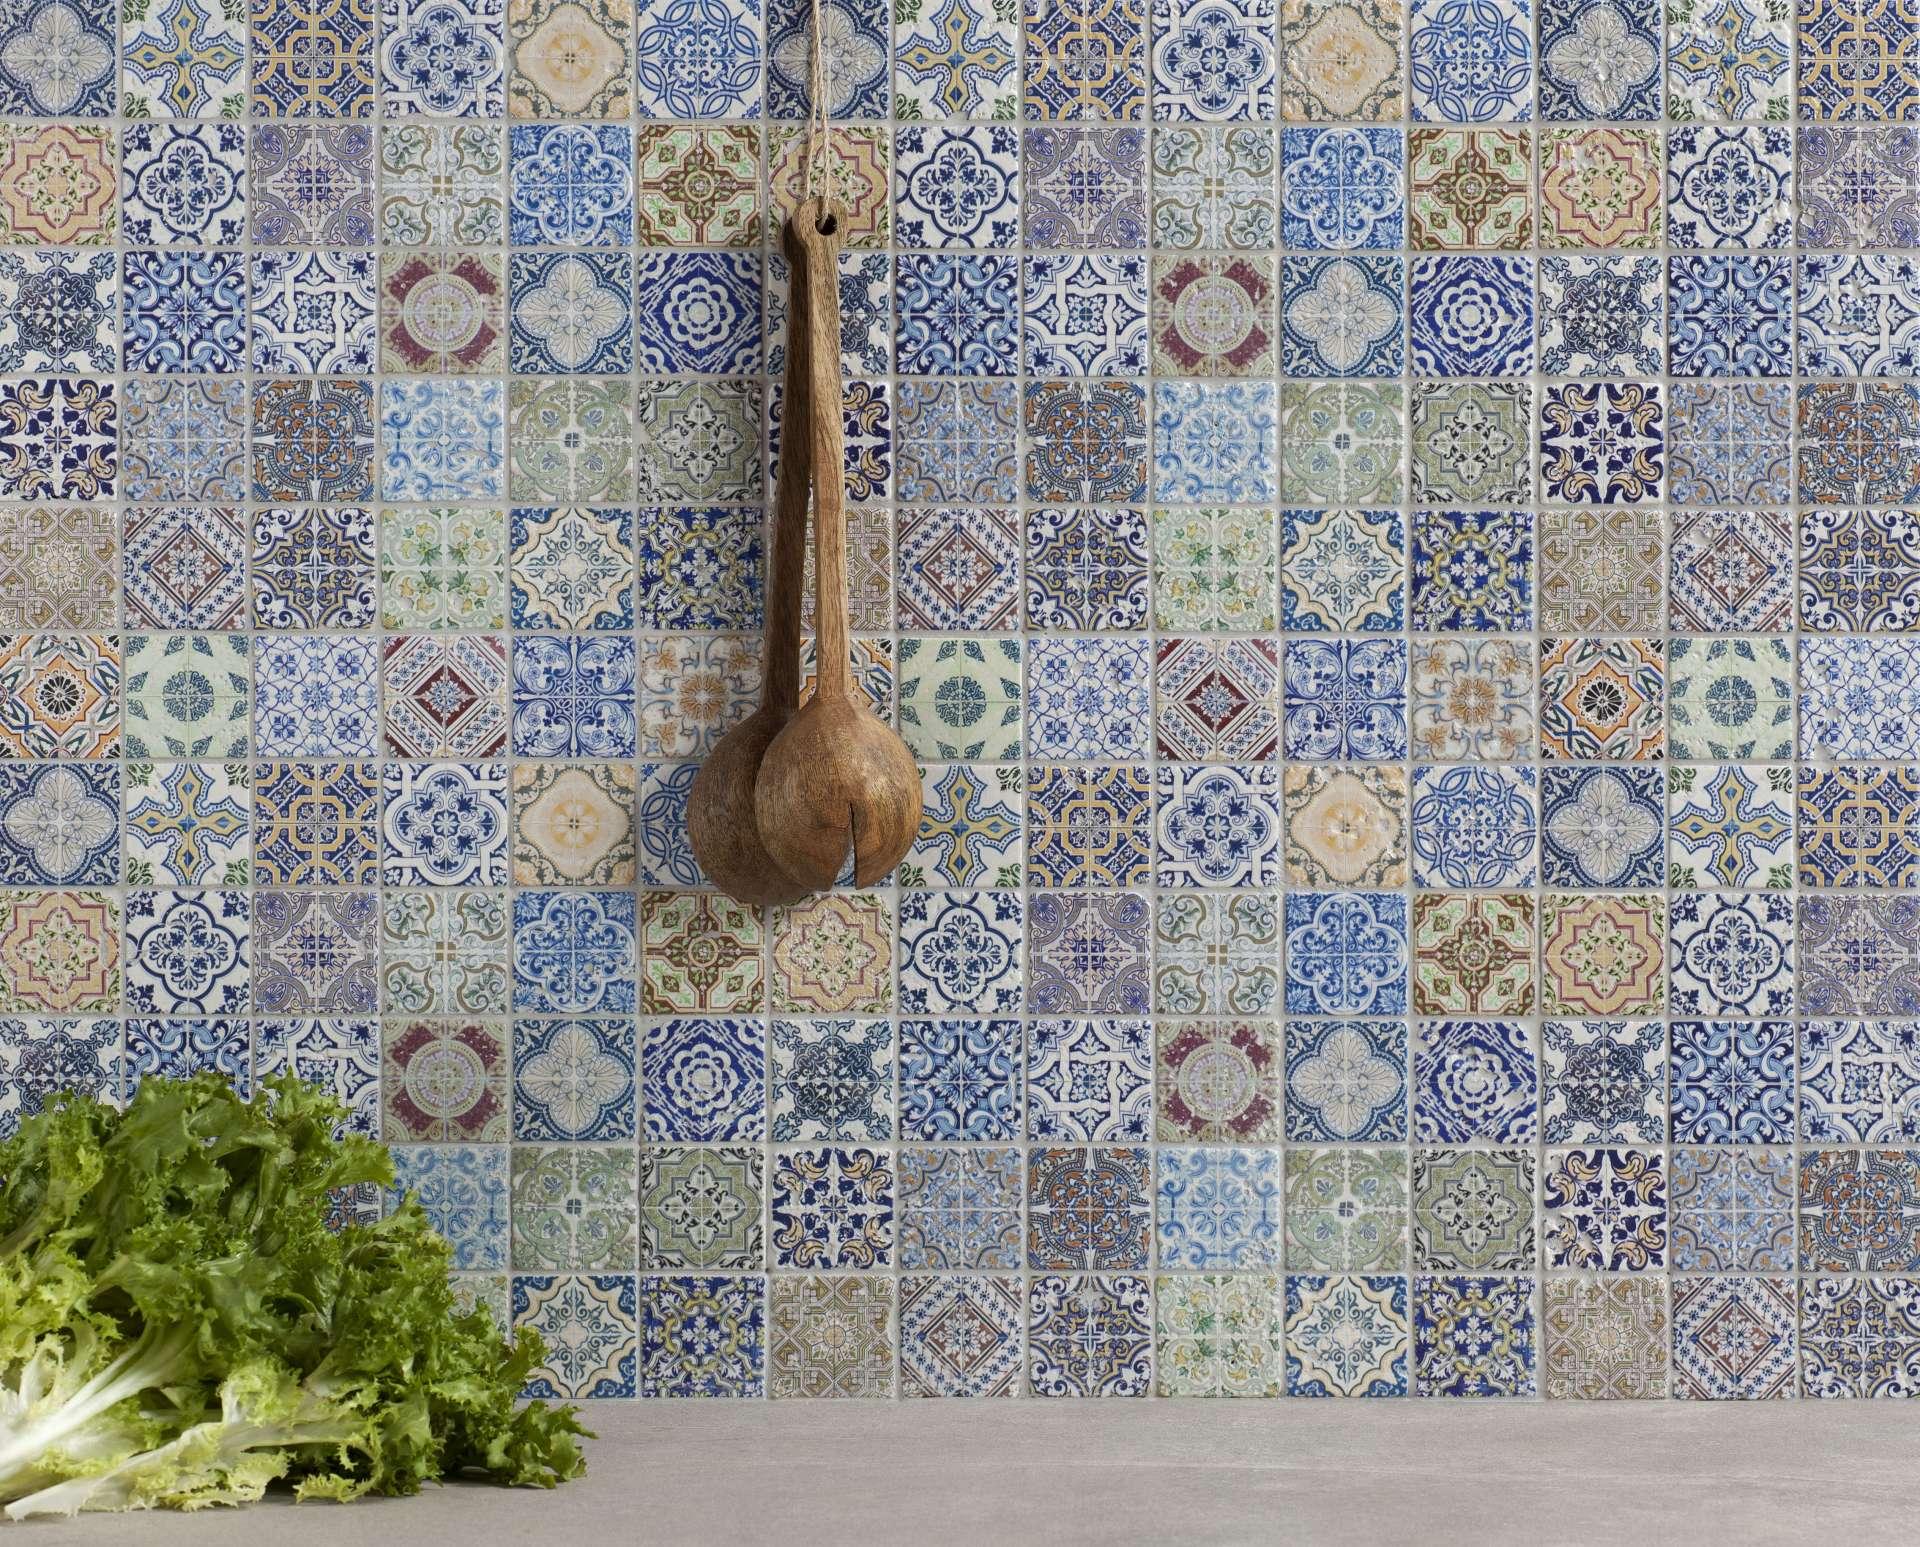 vintage-interiores-disen%cc%83o-cocina-toledo-illescas-yuncos-azulejos